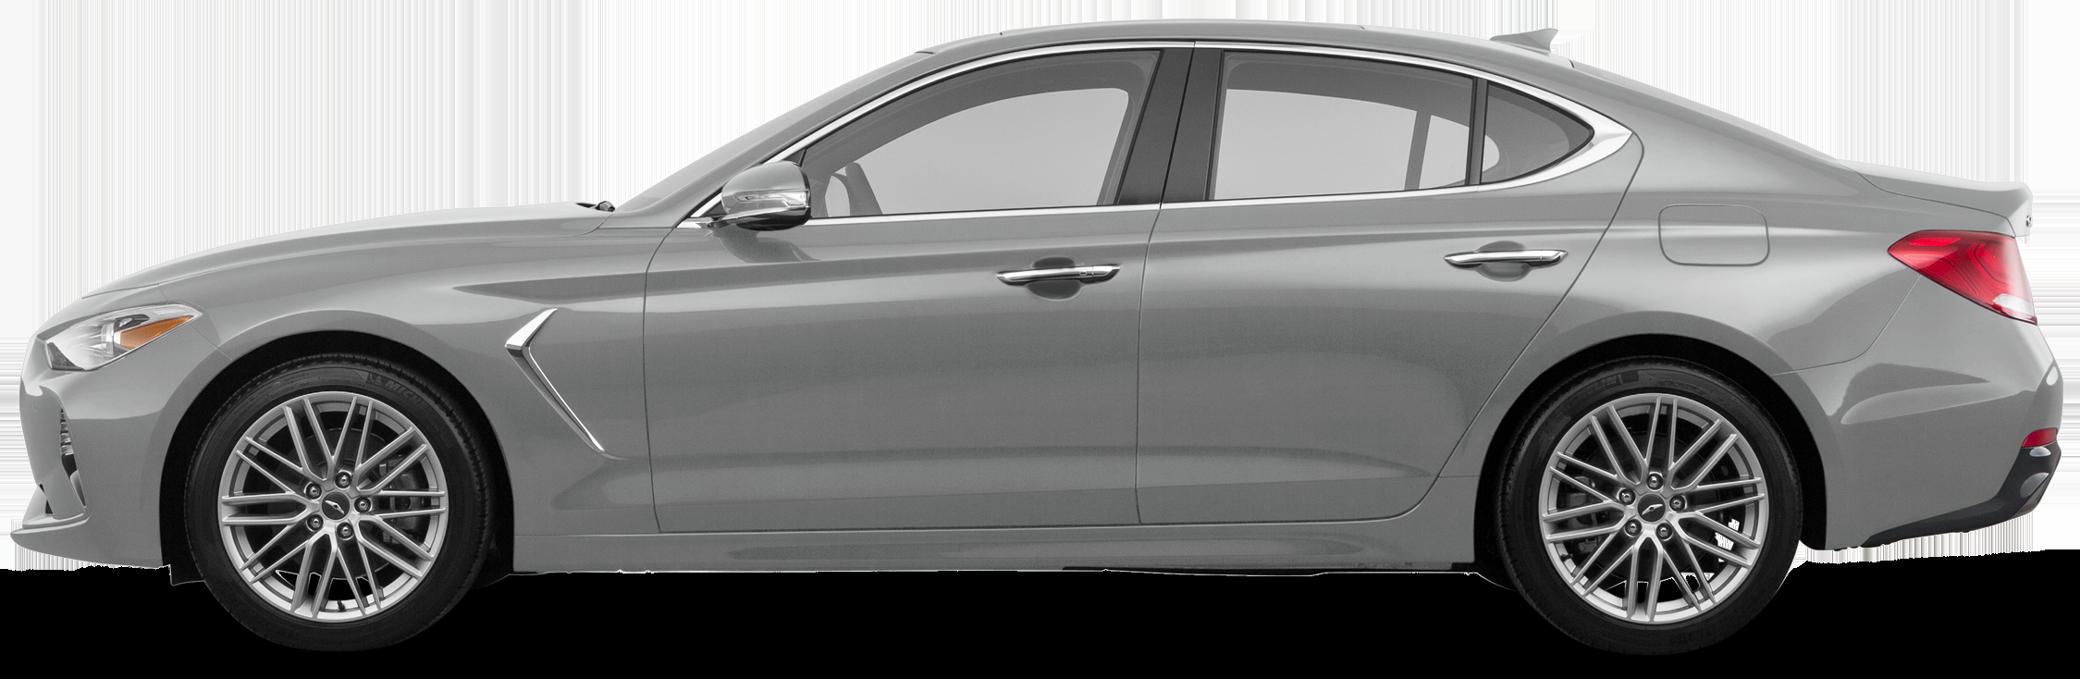 2021 Genesis G70 Sedan 2.0T Standard RWD